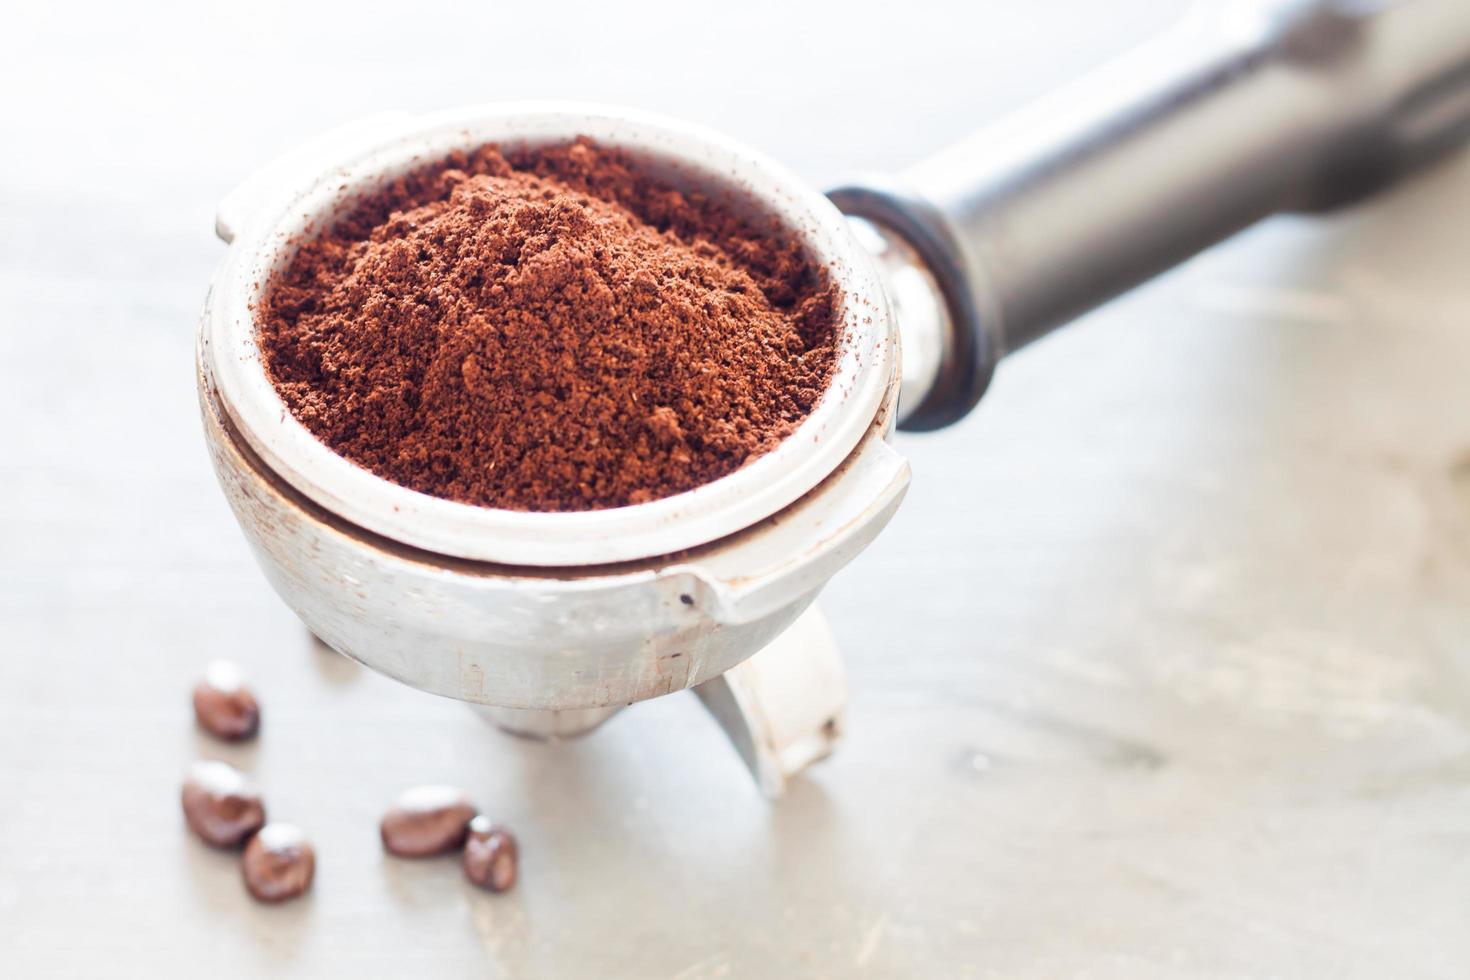 kaffekvarn med kaffe i den foto